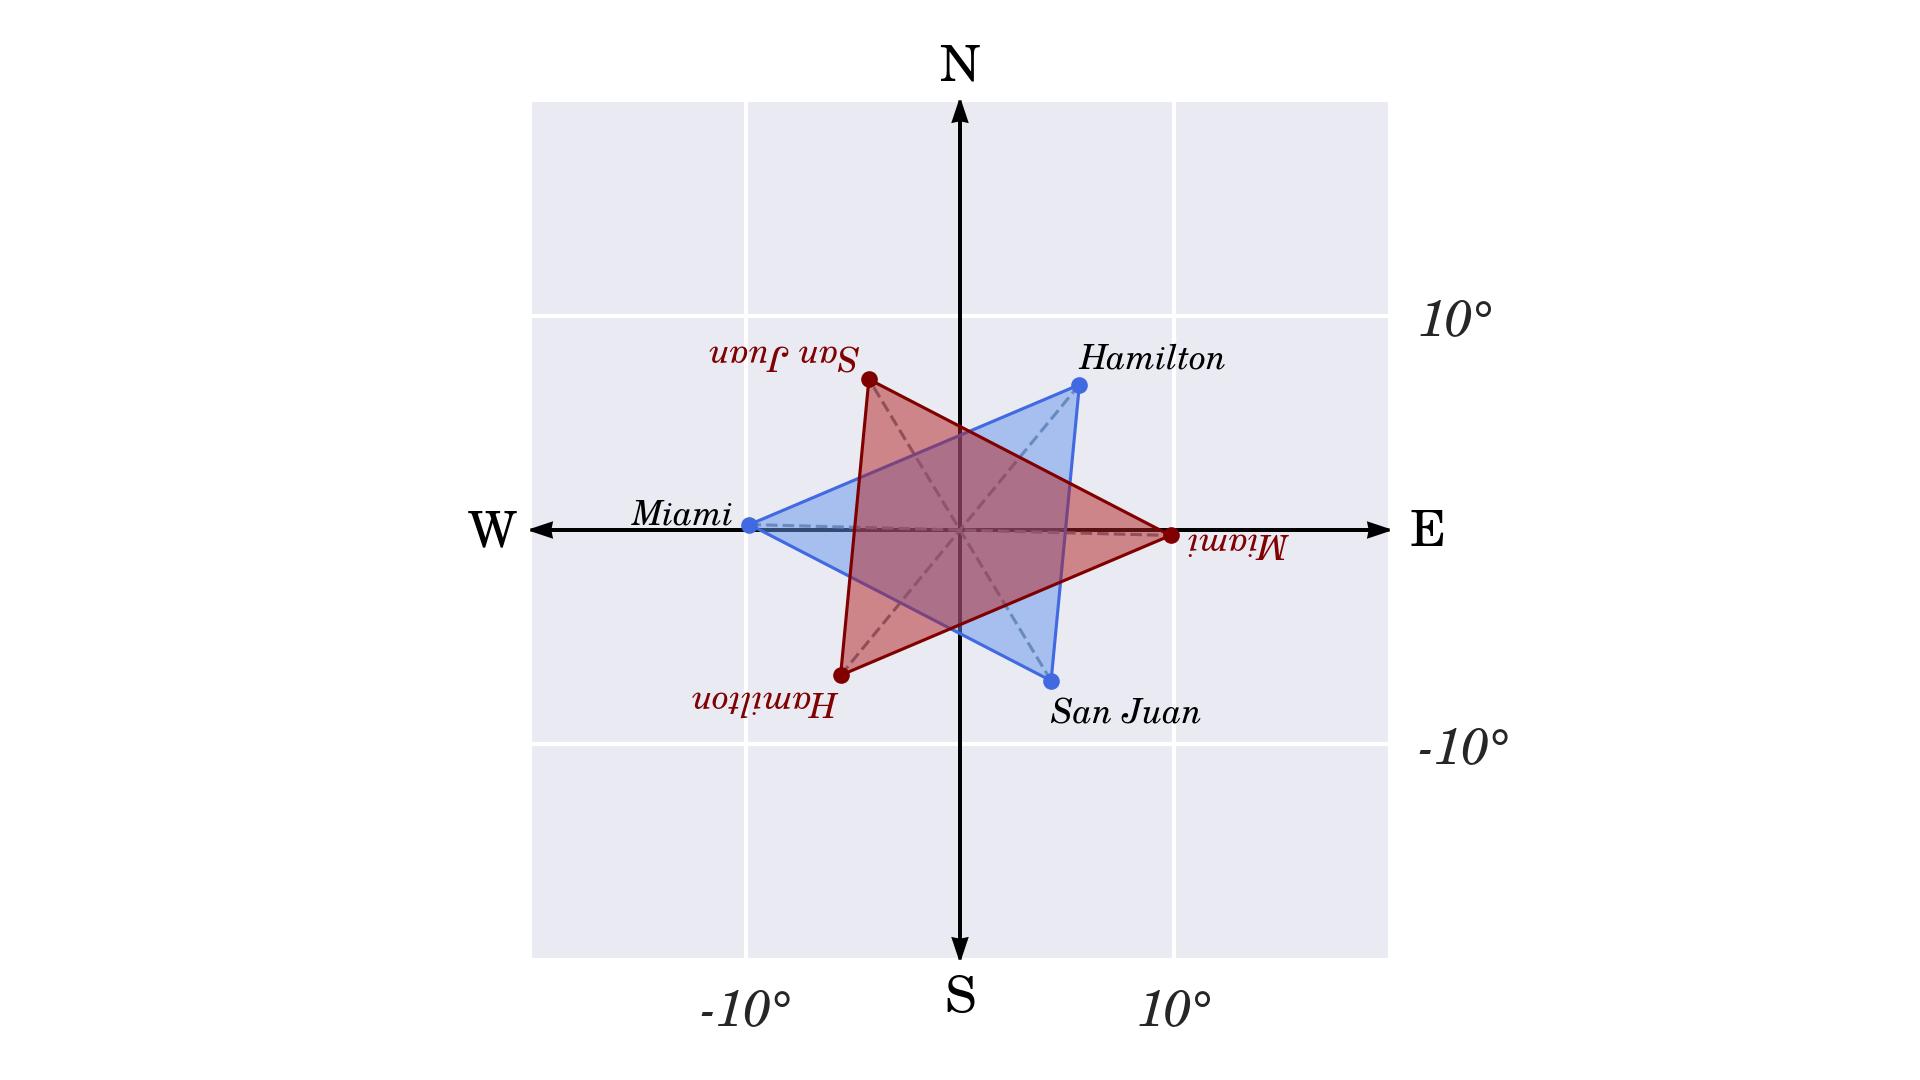 Symmetry of the Bermuda Triangle